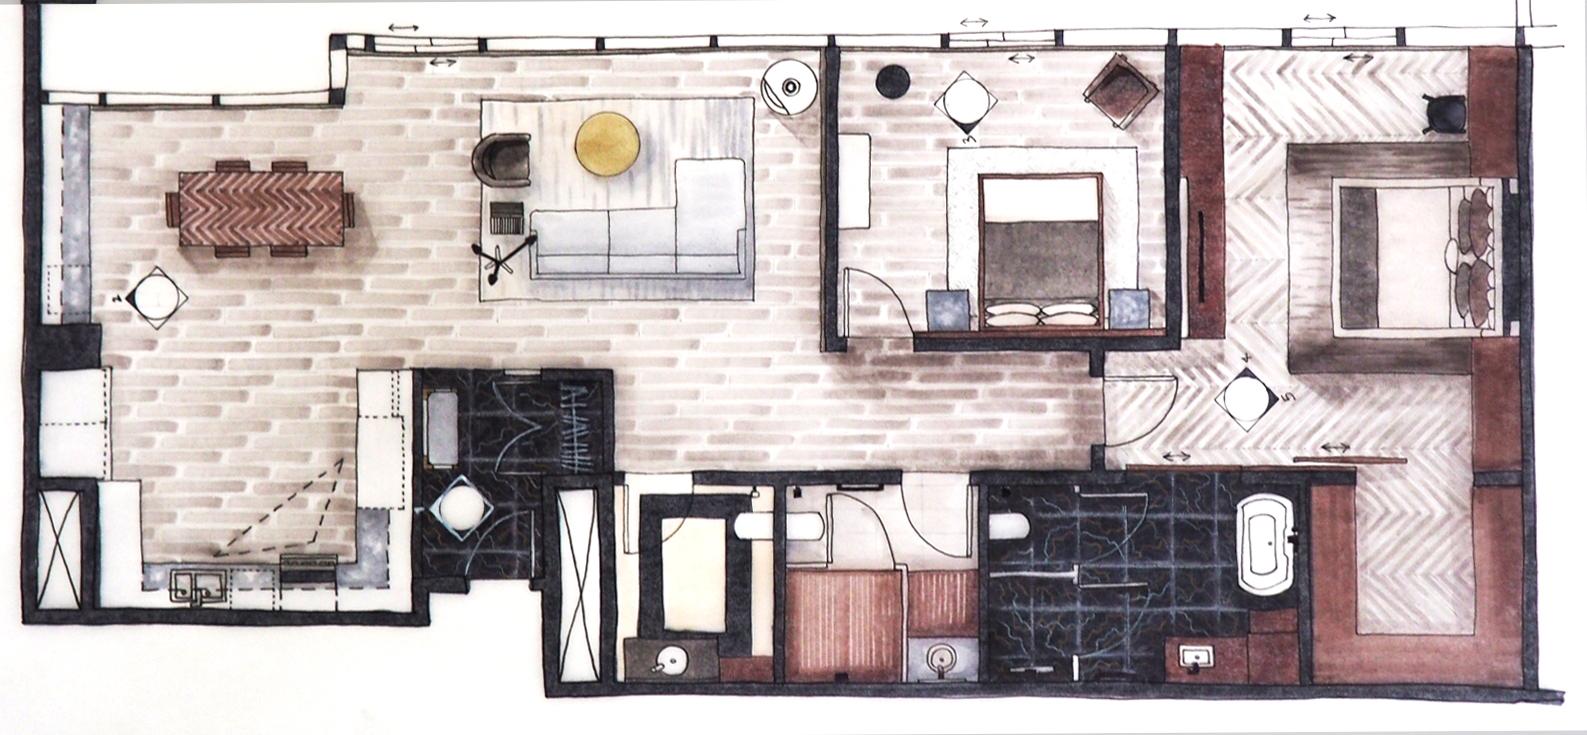 P2_Floorplan RE-EDITED.jpg